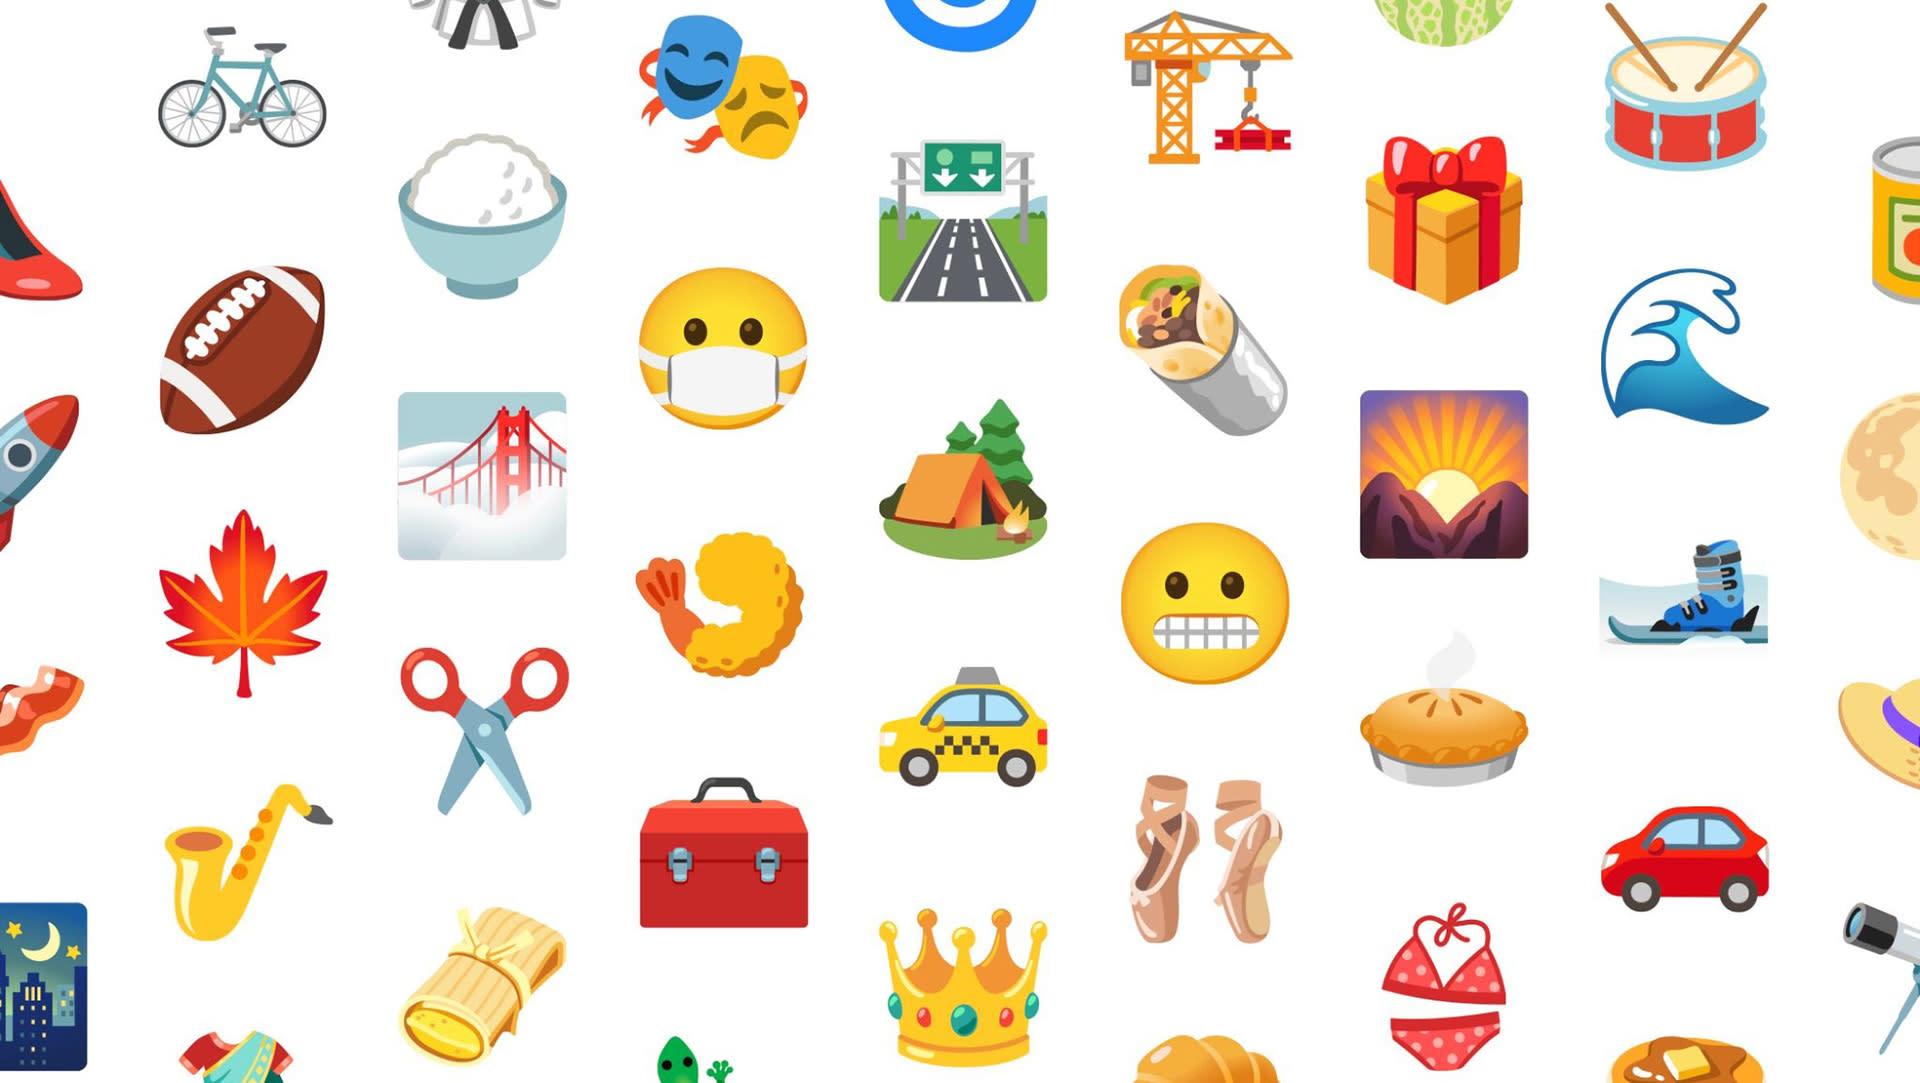 Android 12 emoji selection